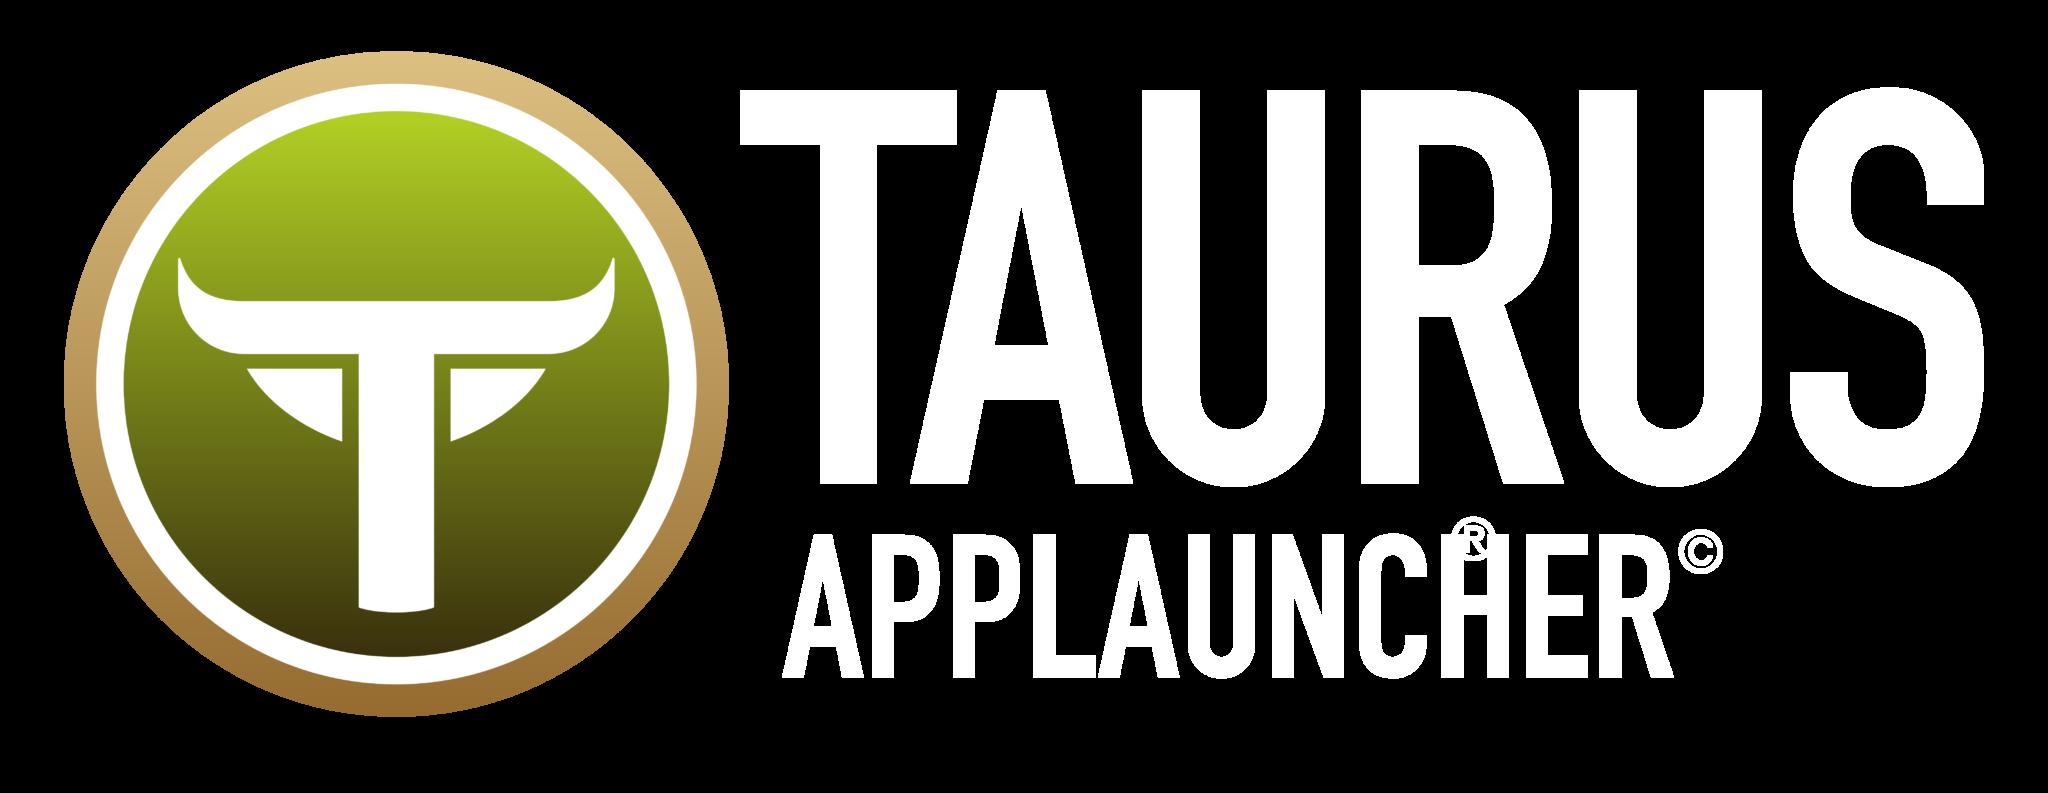 Taurus Marketing logos 53 1